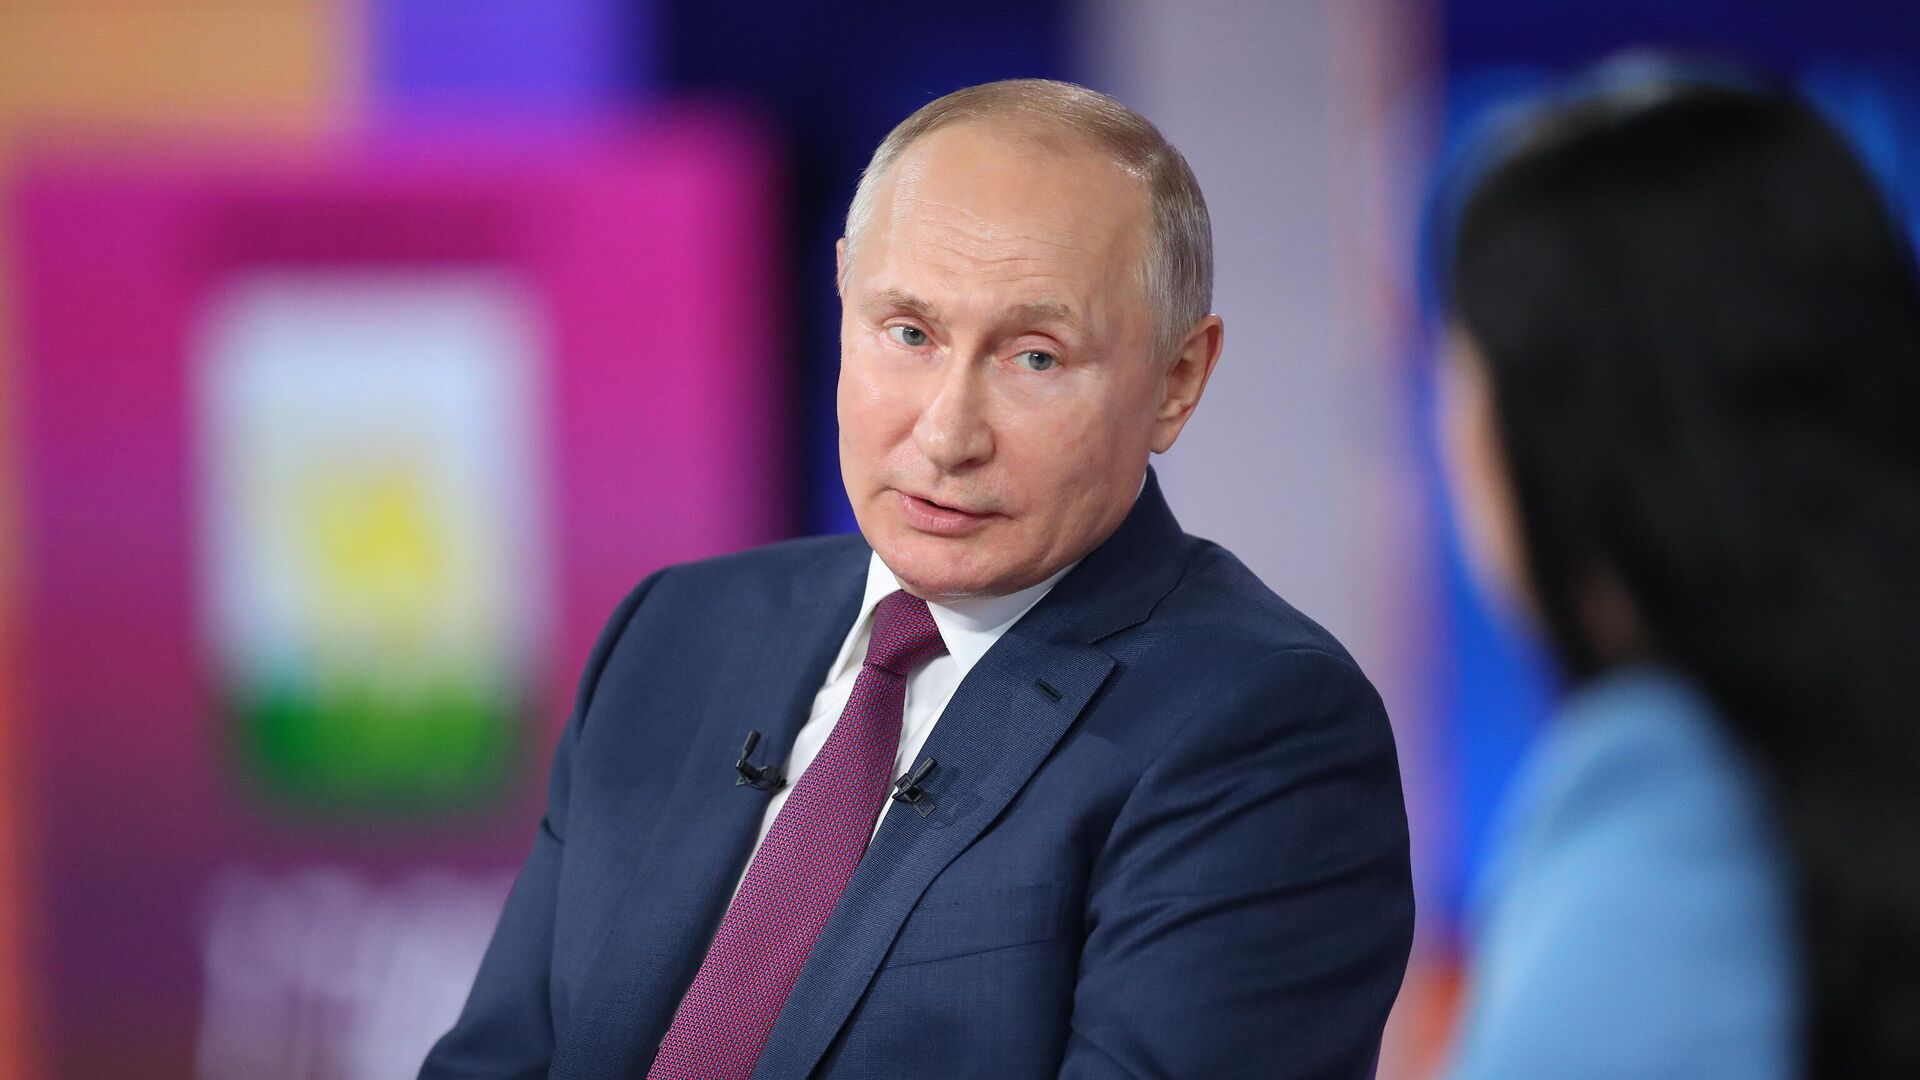 Vladímir Putin, presidente de Rusia - Sputnik Mundo, 1920, 22.08.2021